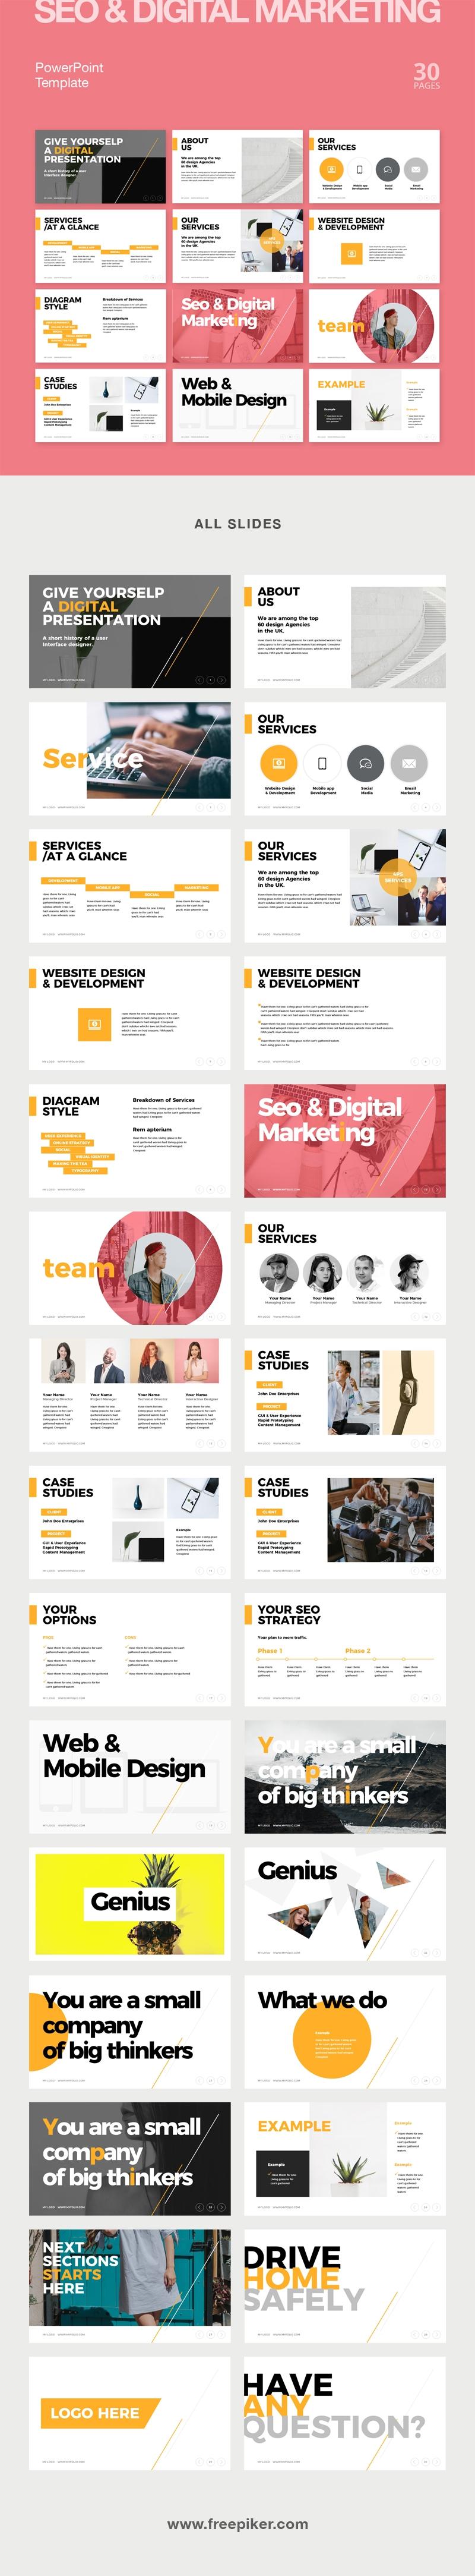 Digital Marketing & SEO Powerpoint